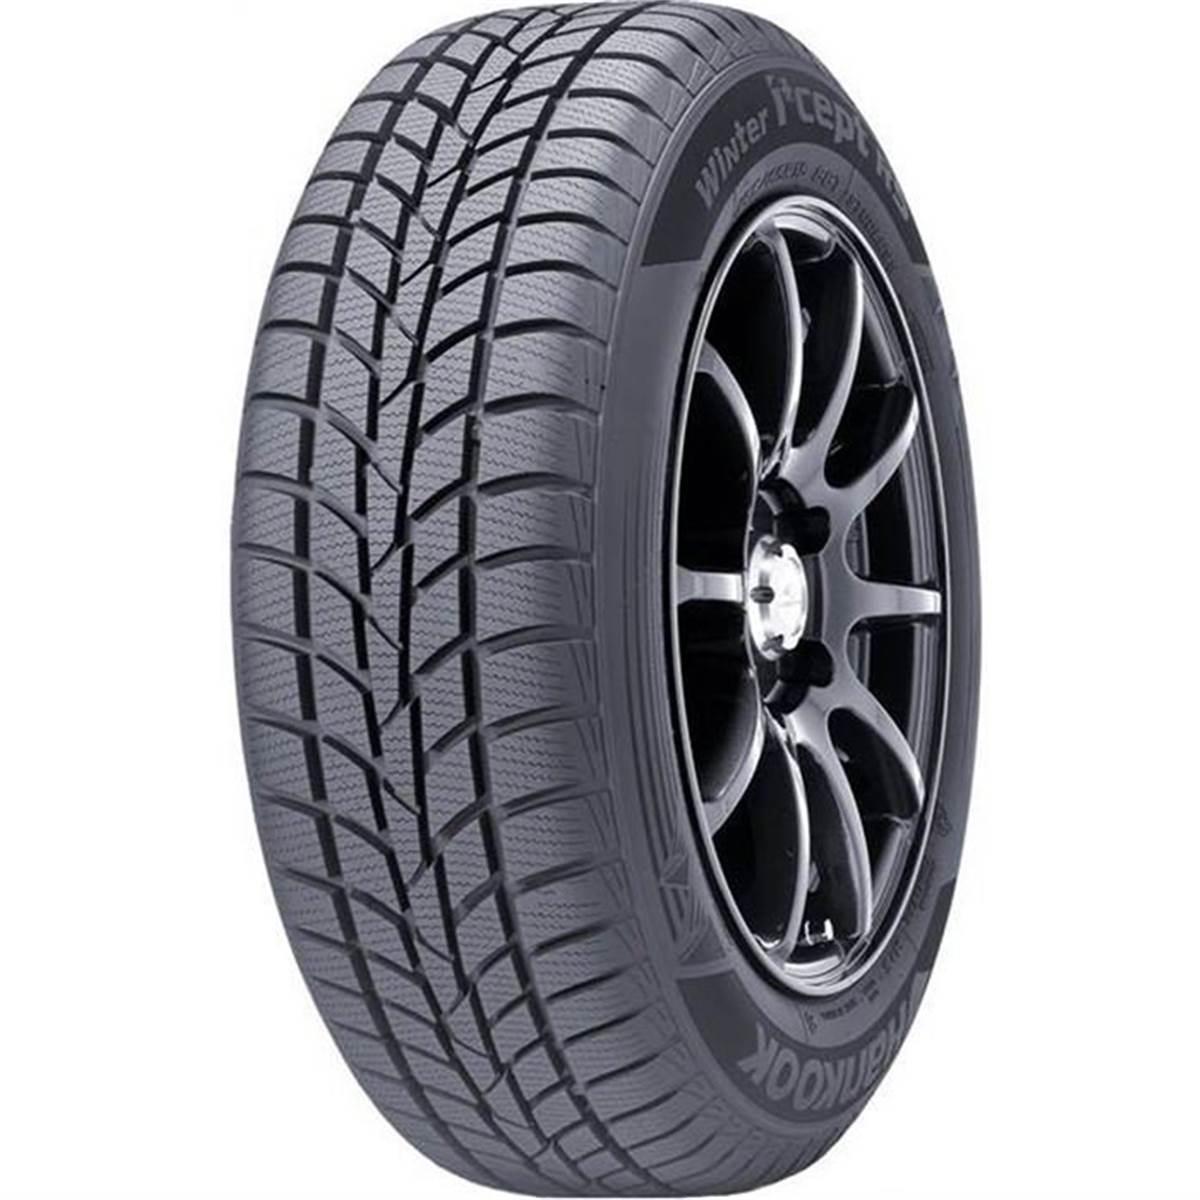 Hankook Winter I-Cept RS W442 pneu